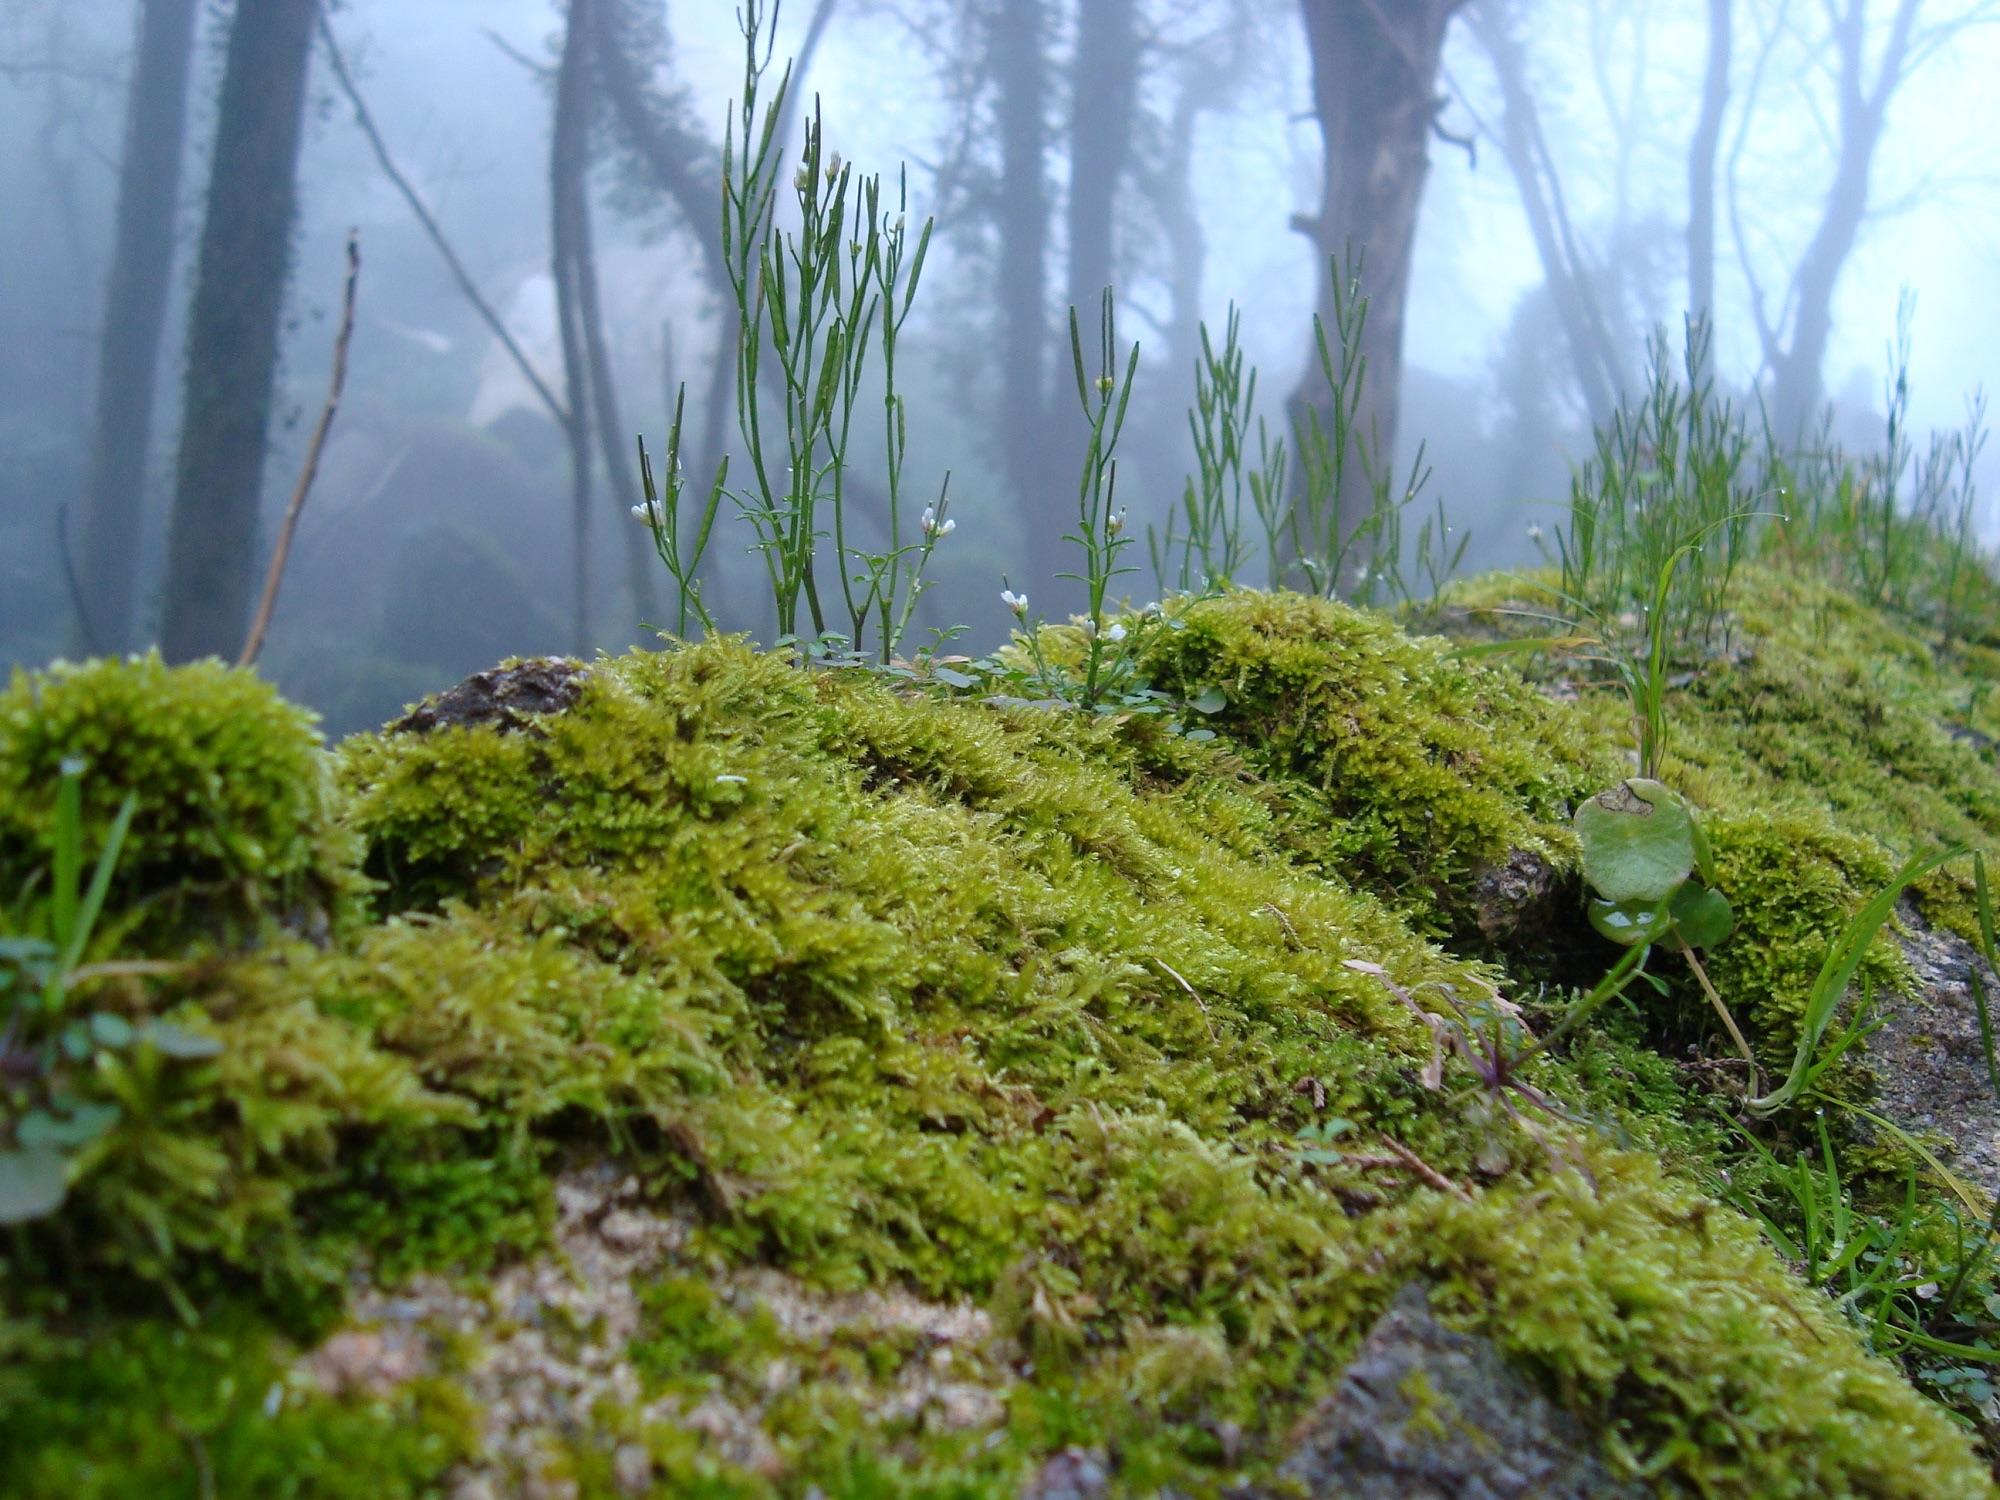 images gratuites arbre plante mousse vert jungle pic a algues v g tation for t. Black Bedroom Furniture Sets. Home Design Ideas